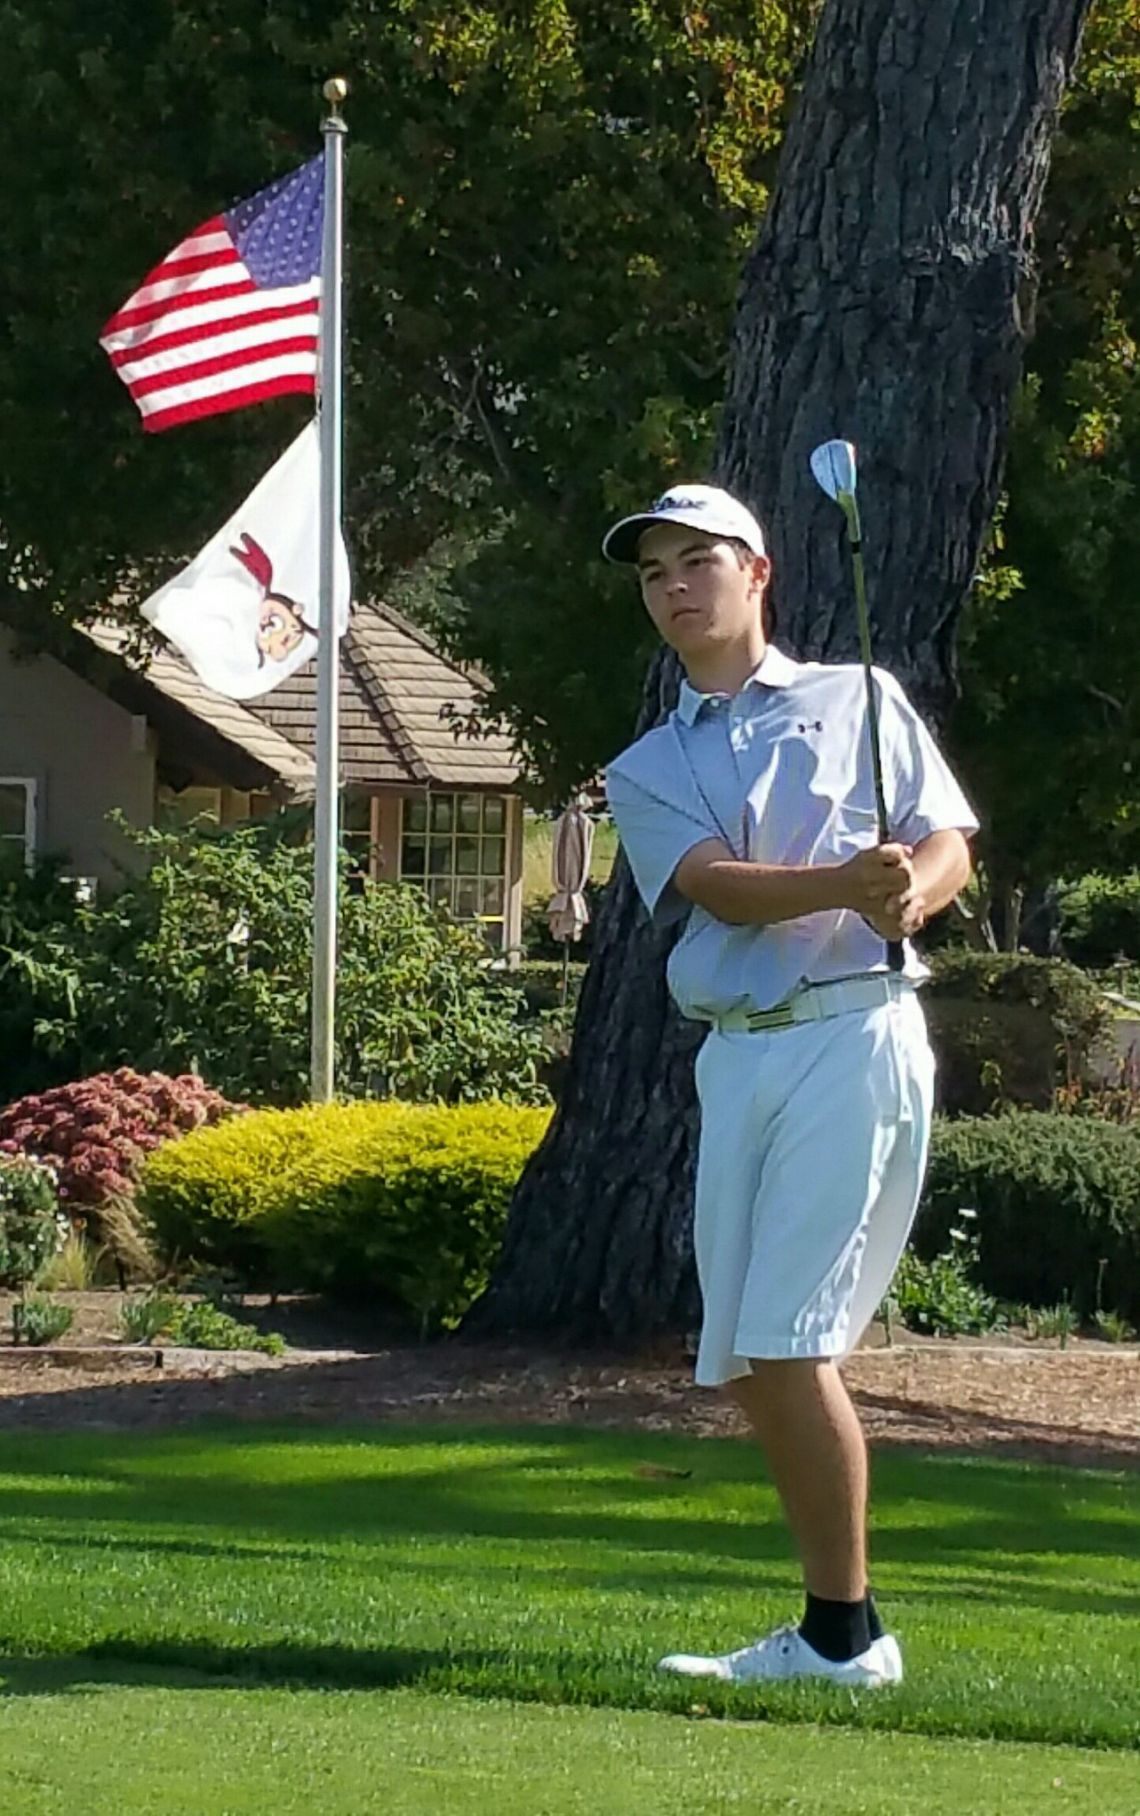 PGA Tour: Brian Stark hits a shot